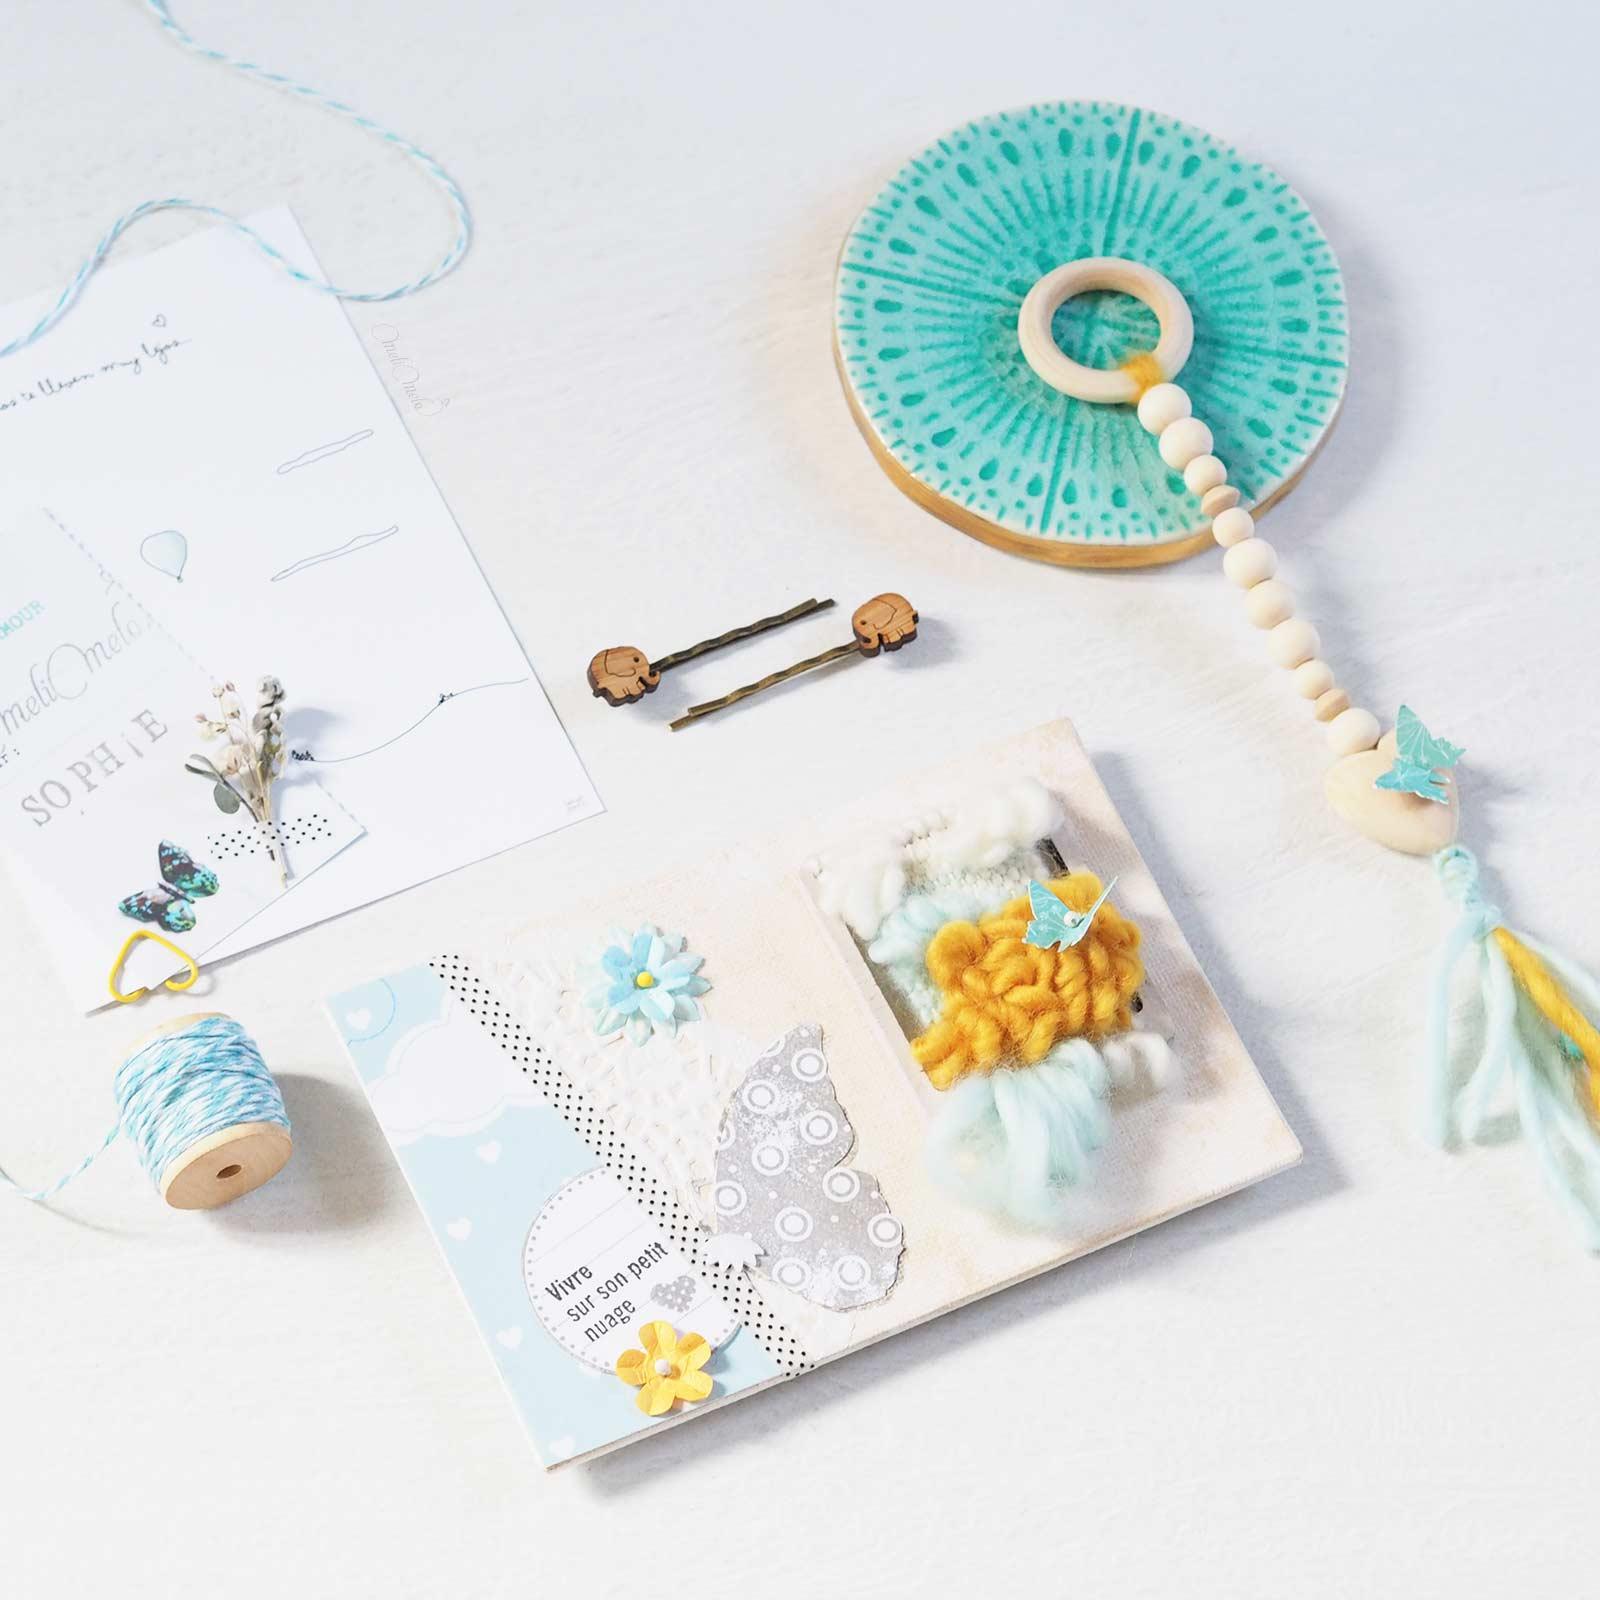 happymail bleu mini-tissage en laine merinos weareknitters carte postale crafts scrapbooking laboutiquedemelimelo